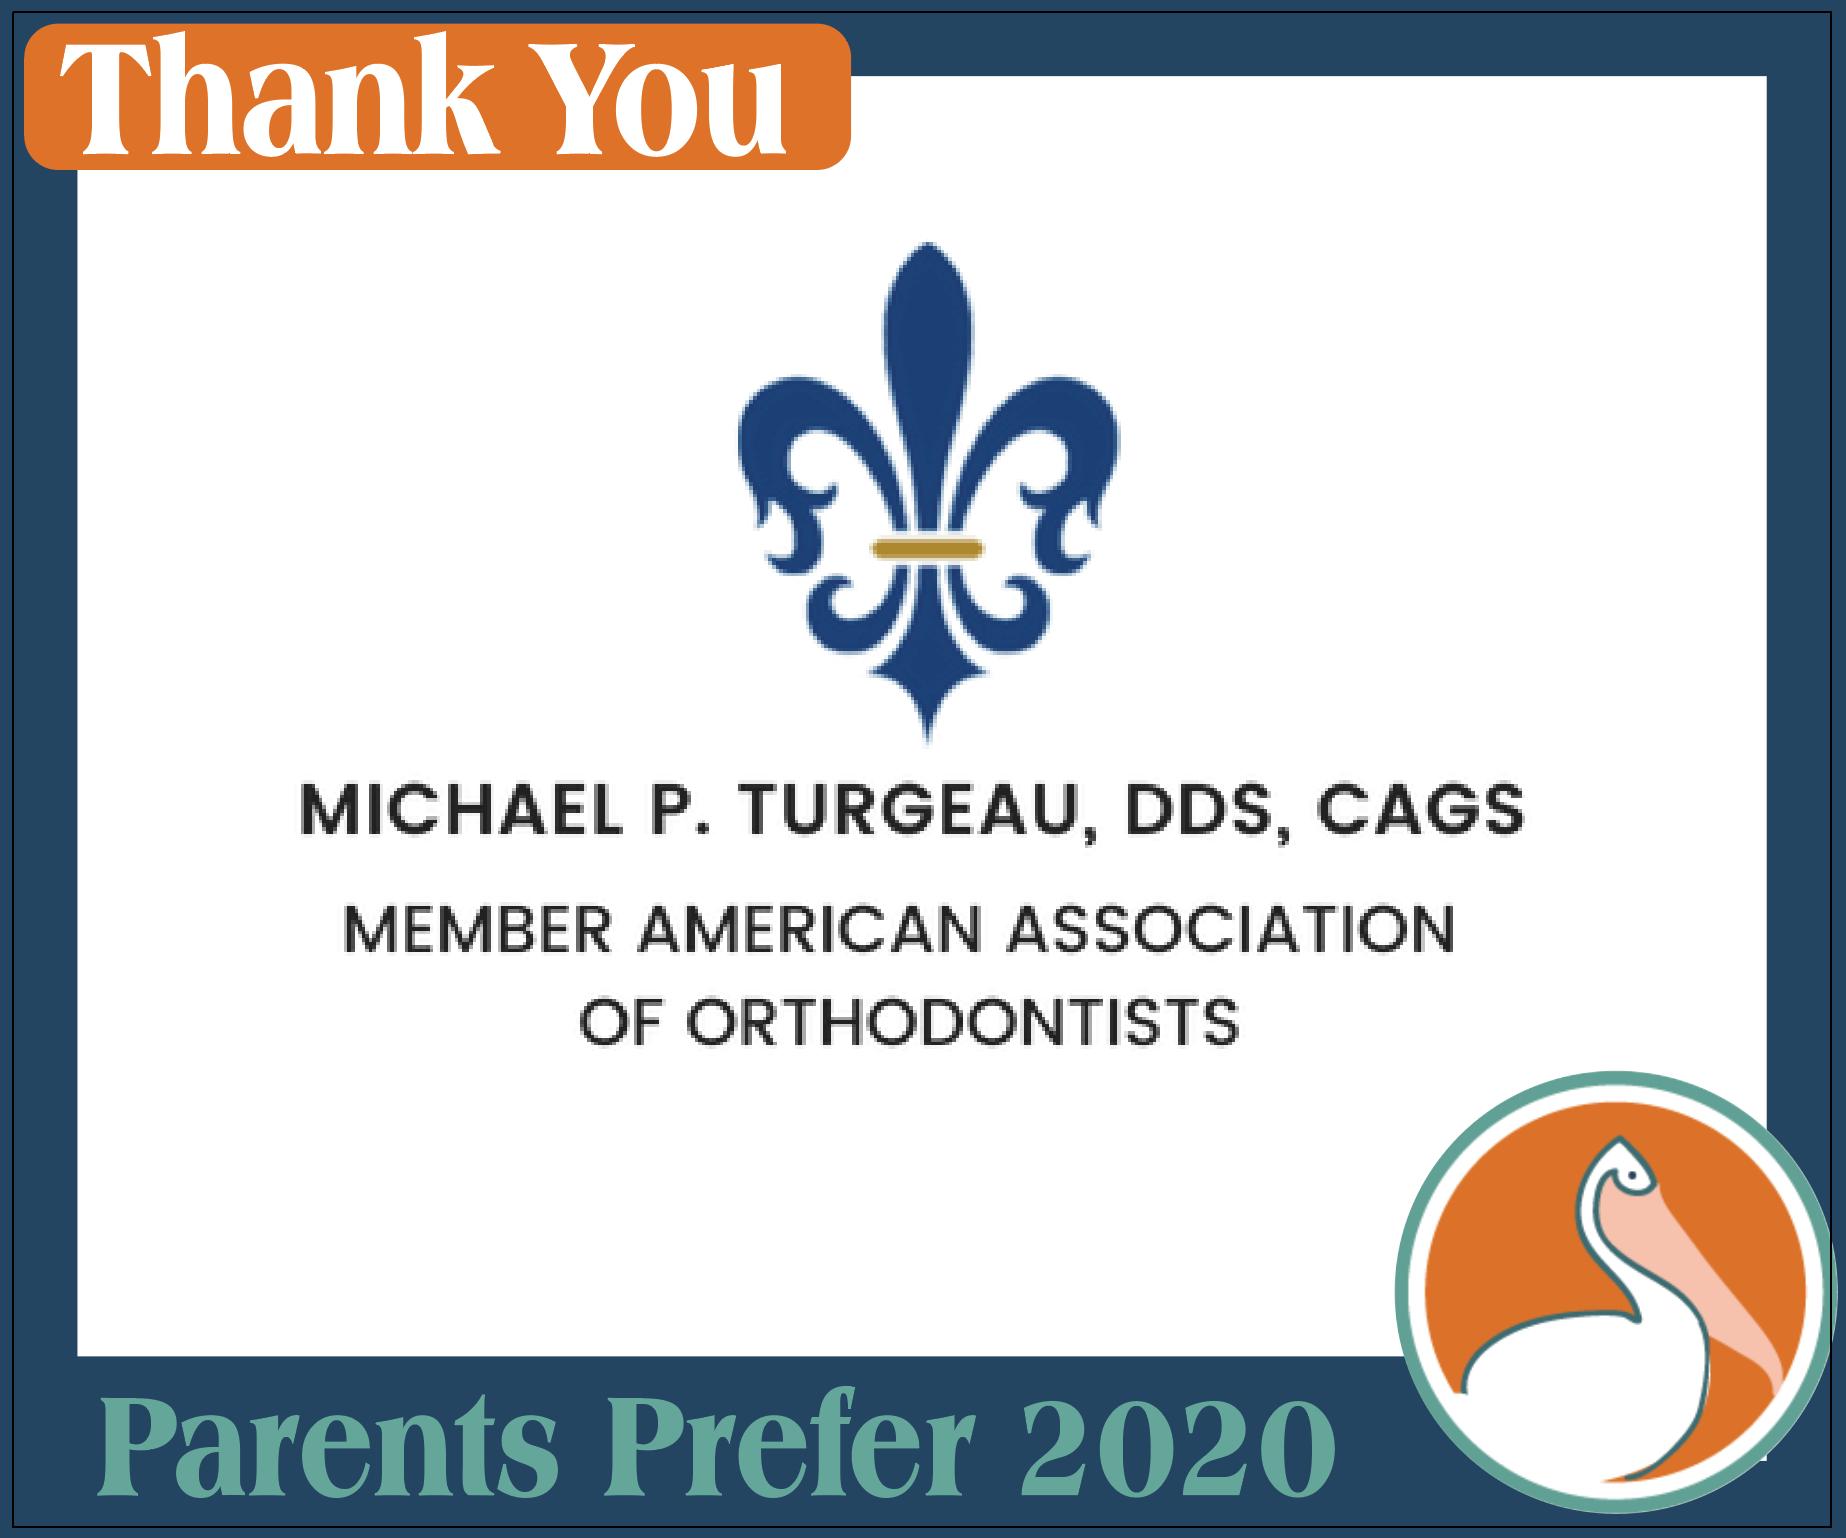 Michael Turgeau DDS